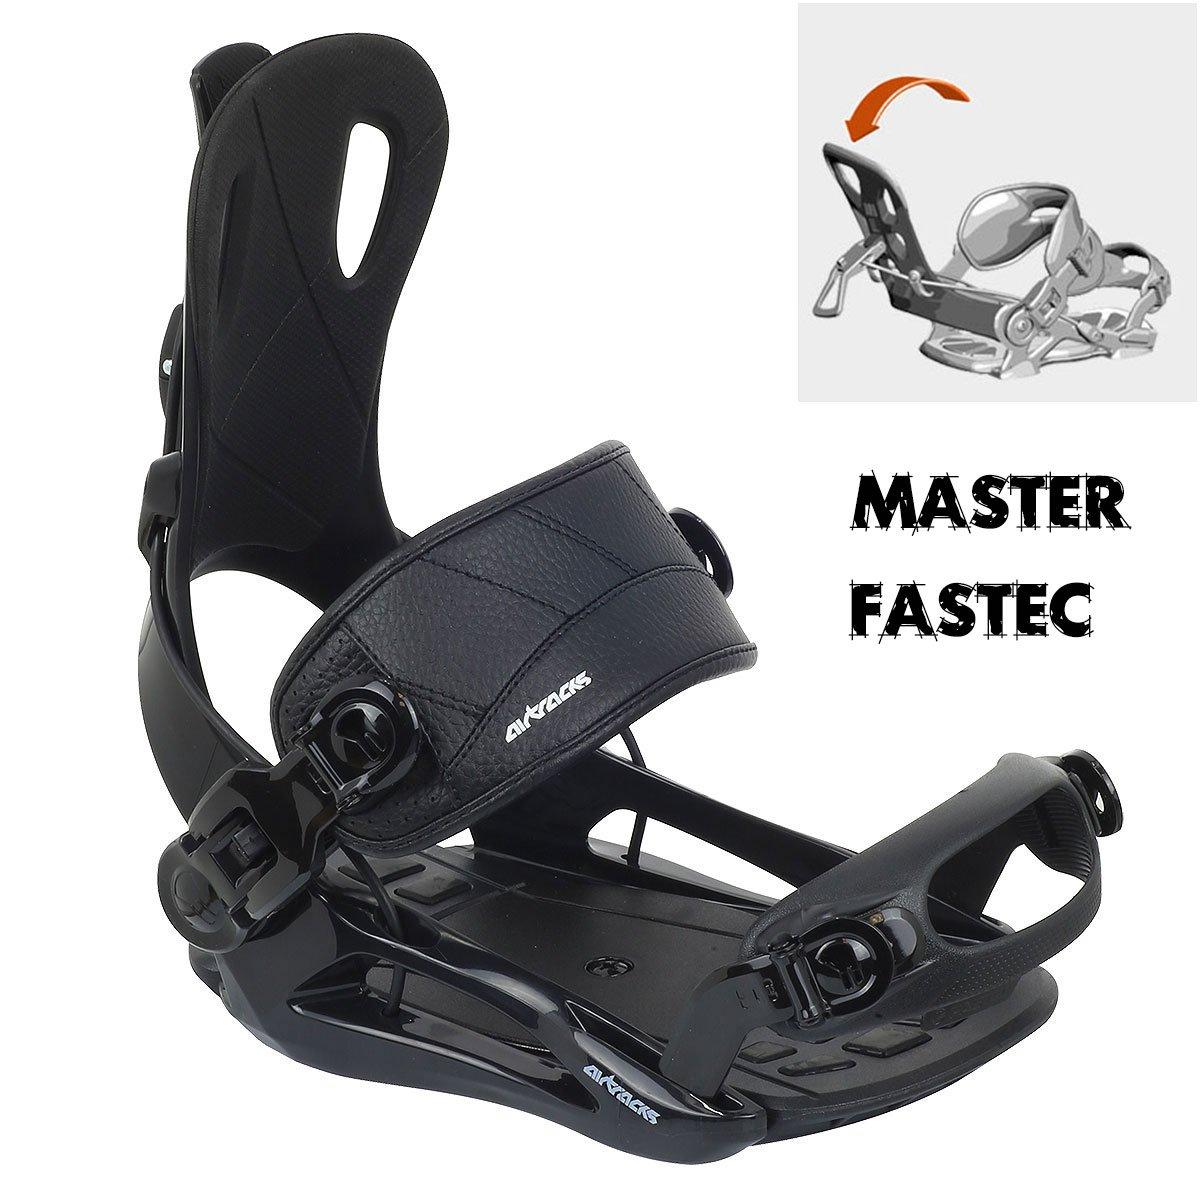 Fijaciones Snowboard Star o Master Fastec SB Bag//156/159/165/cm AIRTRACKS//Places Flat Rocker